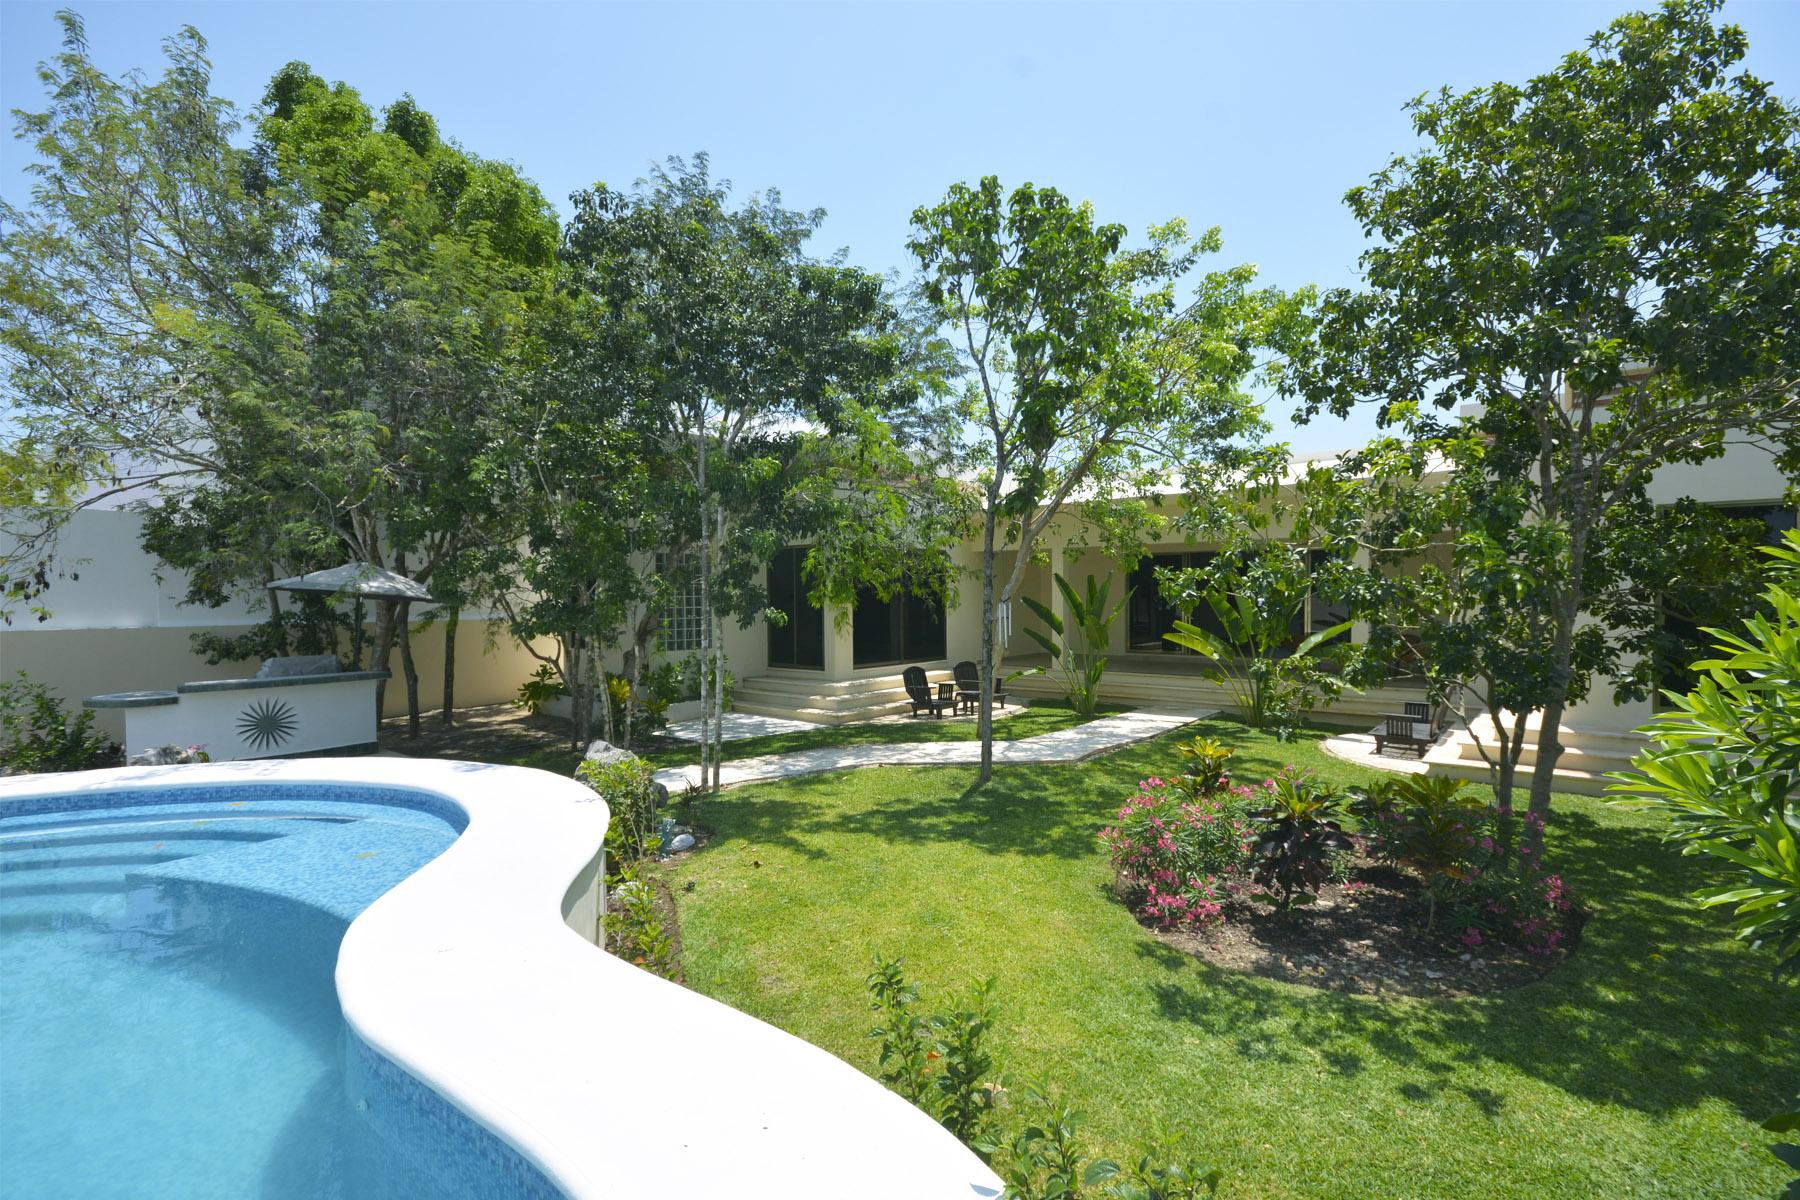 Single Family Home for Sale at ENCHANTING GARDEN HOUSE Playa Magna Lote número 42 Y 43 Playa Del Carmen, Quintana Roo 77726 Mexico